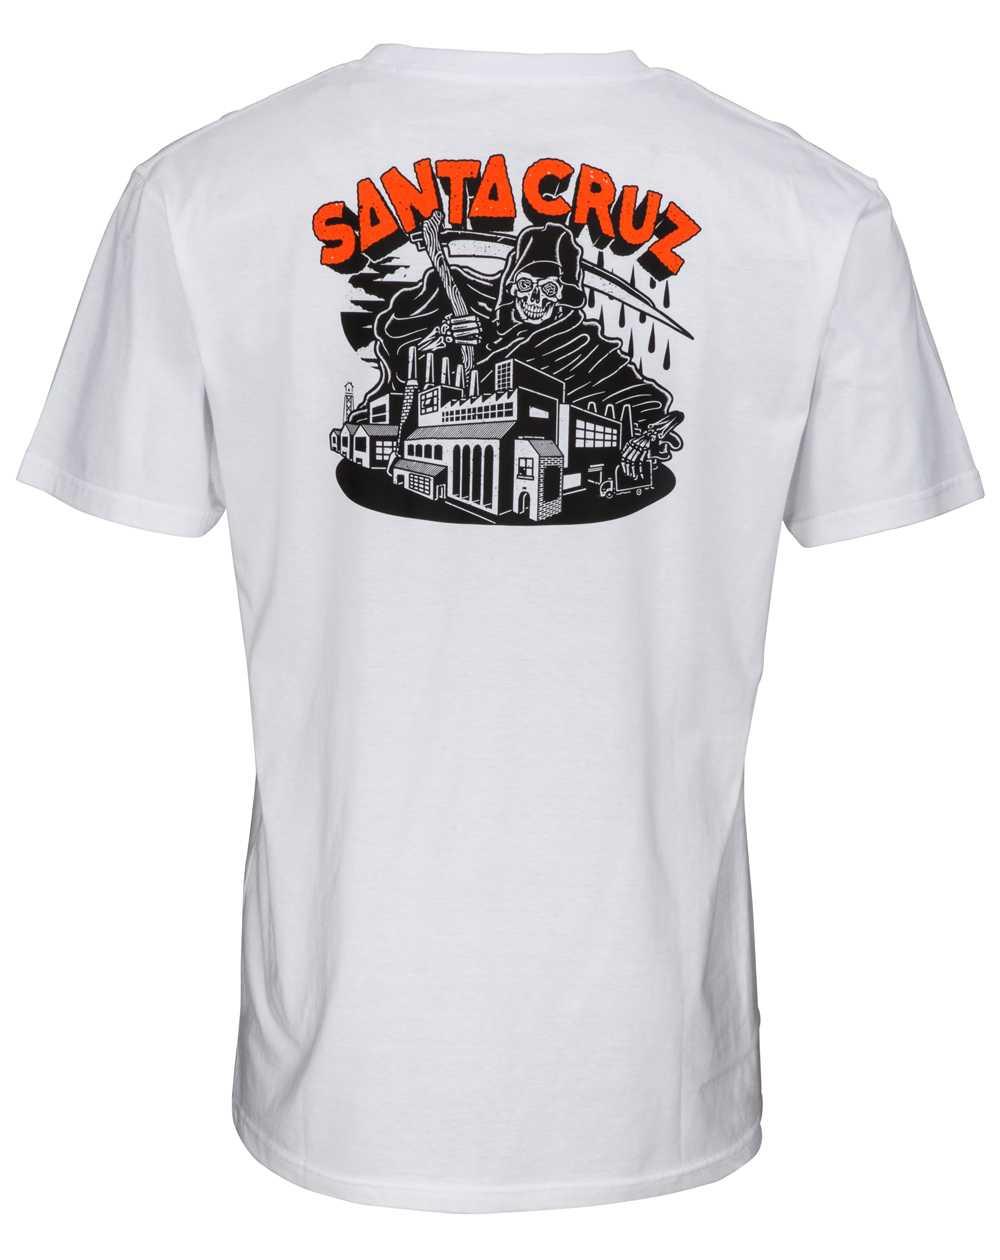 Santa Cruz Fate Factory T-Shirt Homme White